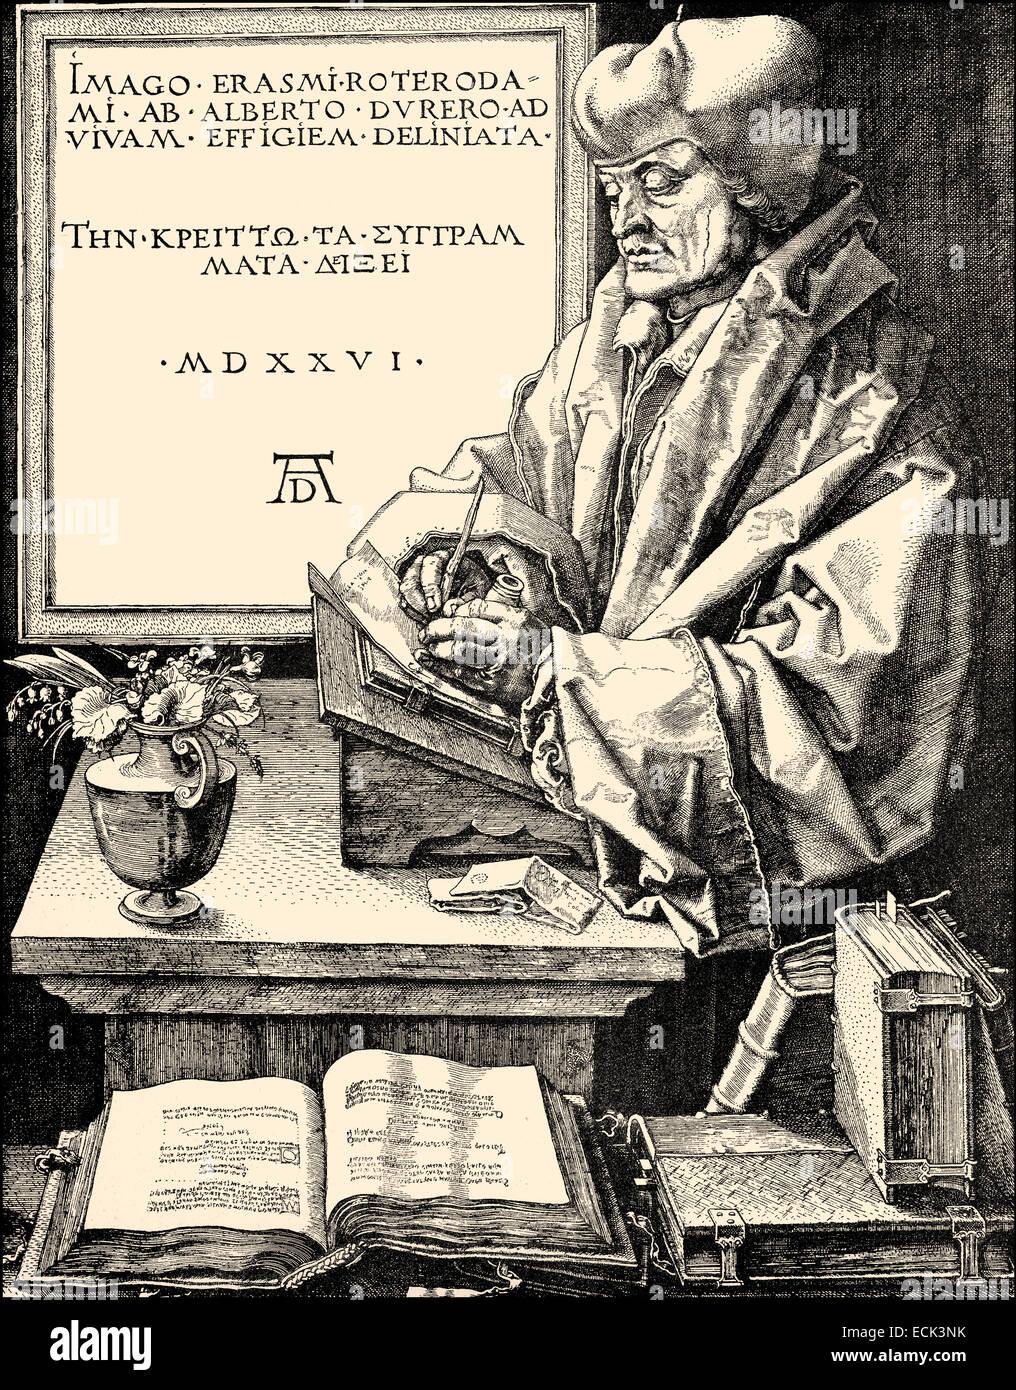 Erasmus Desiderius von Rotterdam, 1465 - 1536, a Dutch humanist, theologian, philosopher, scholar and author, Erasmus - Stock Image